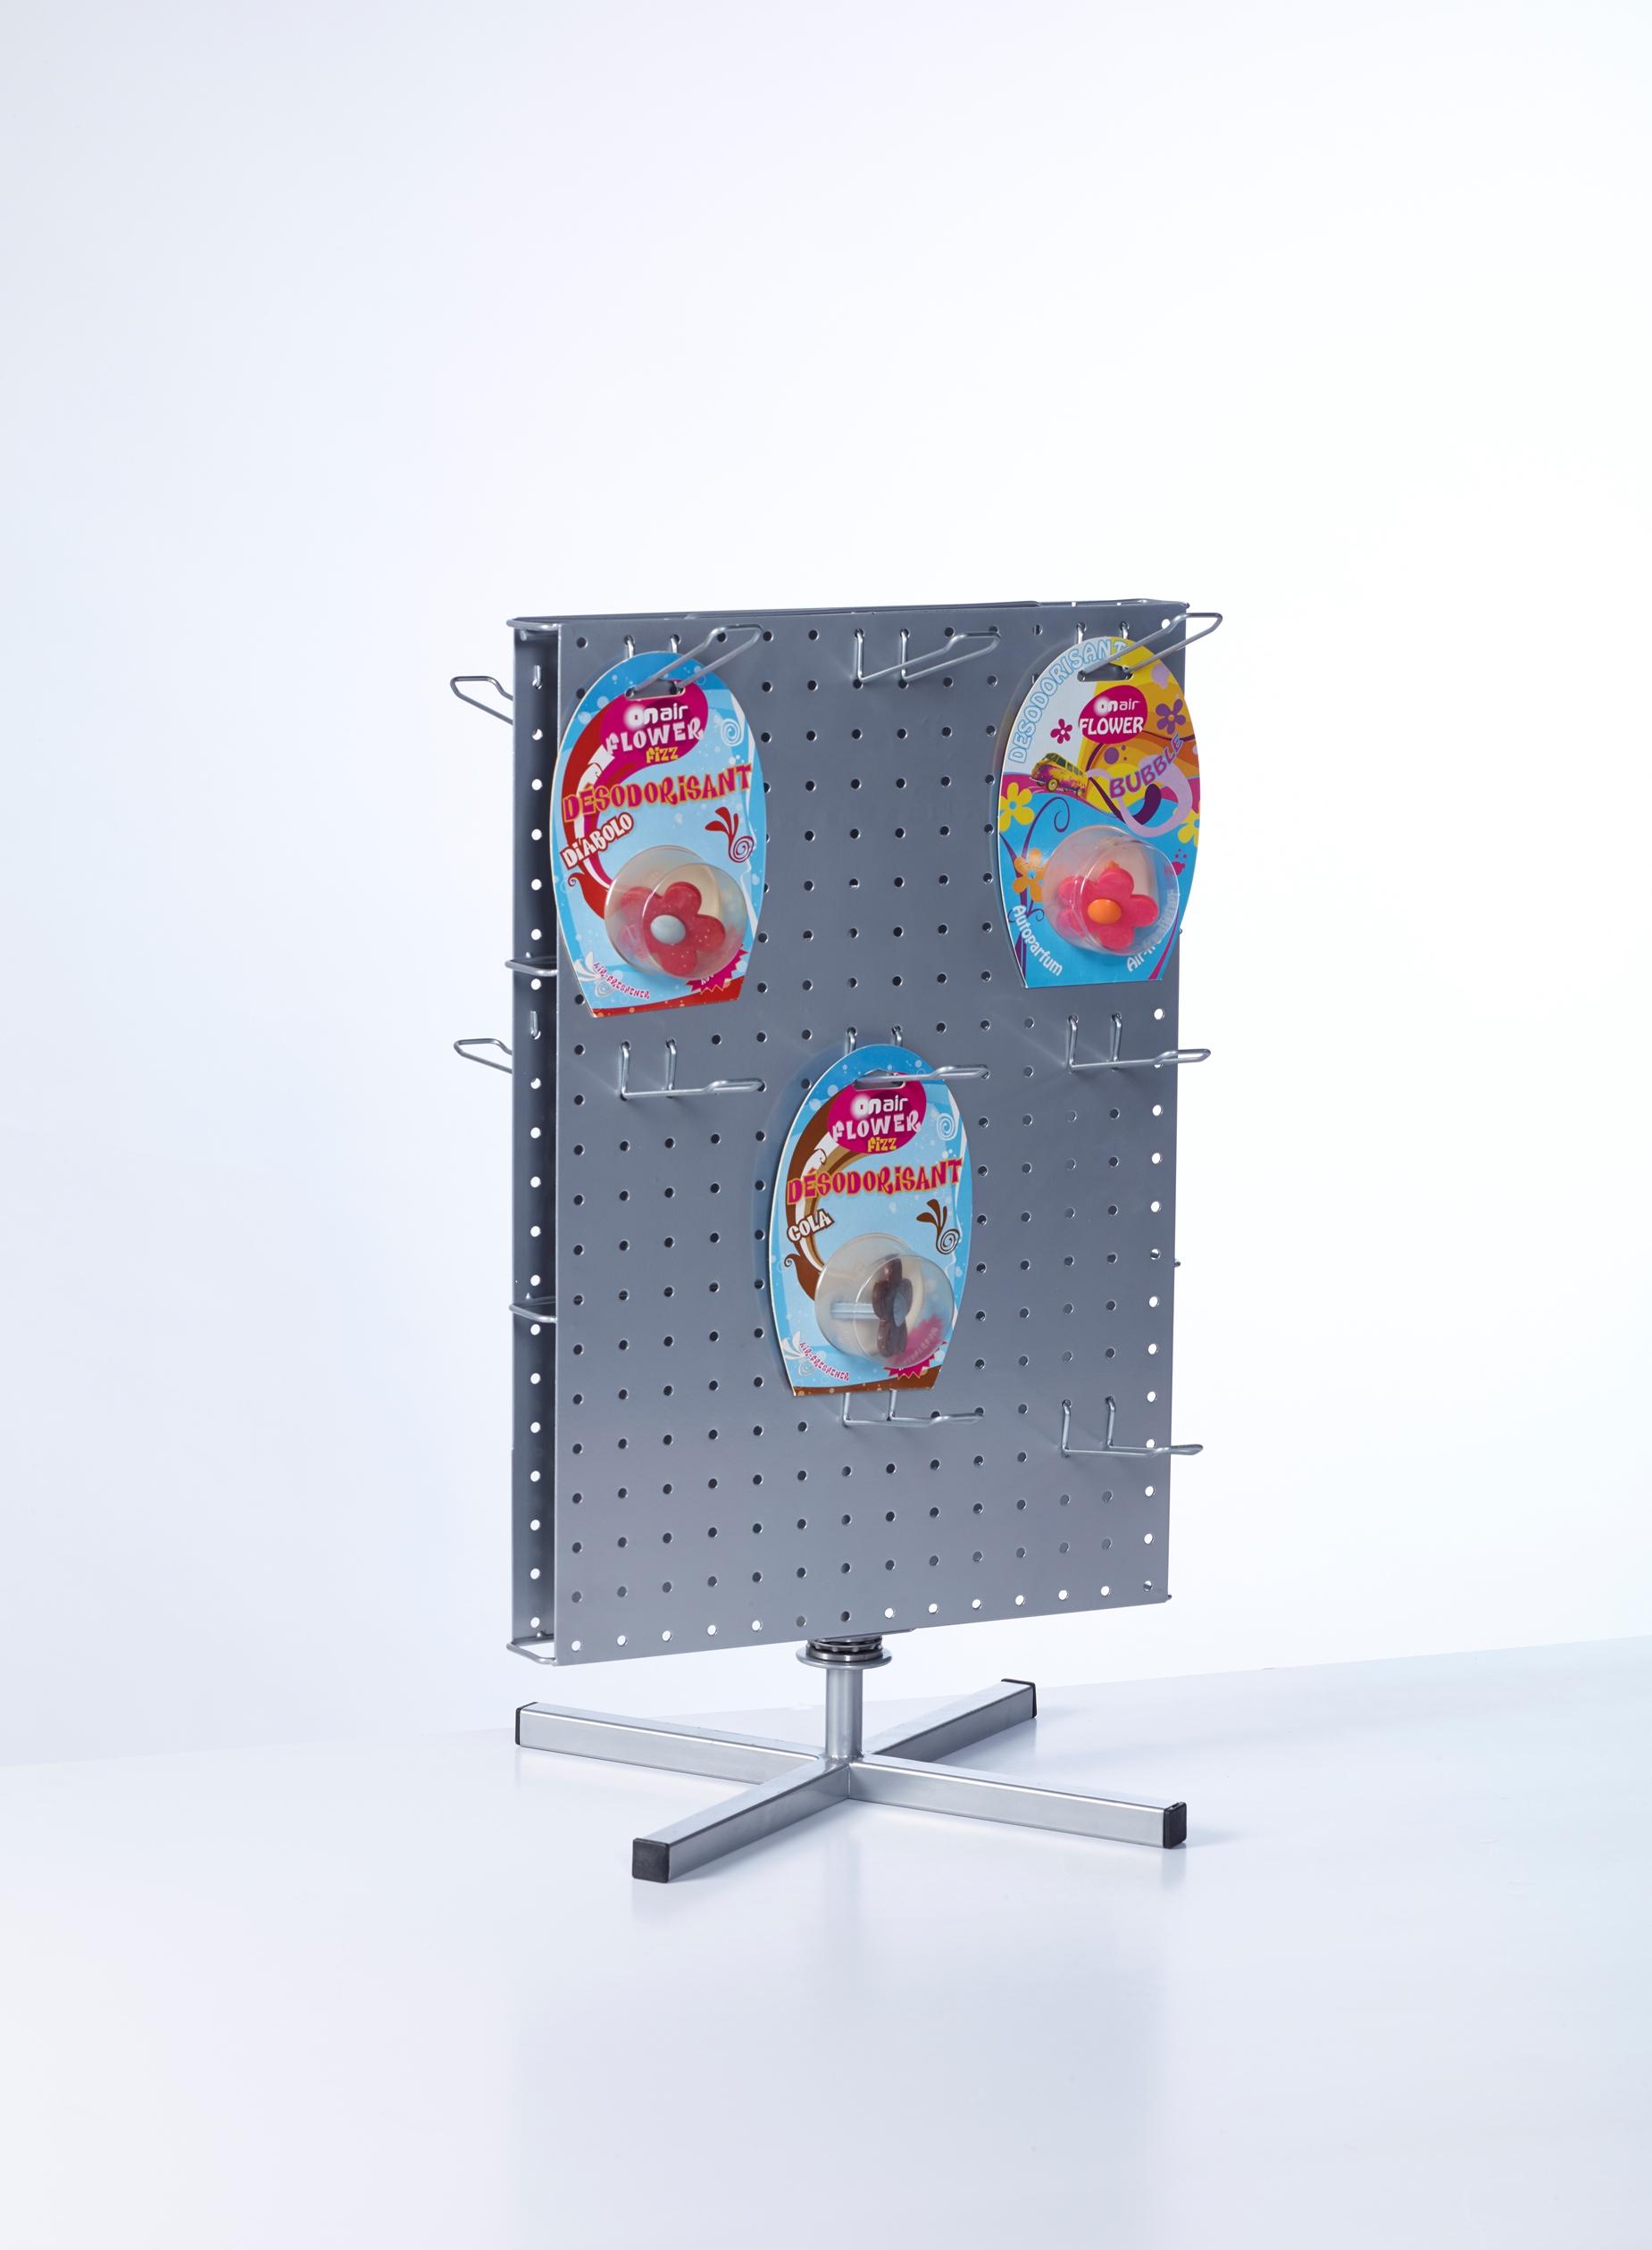 presentoir pour broches - buyck displays - BU960